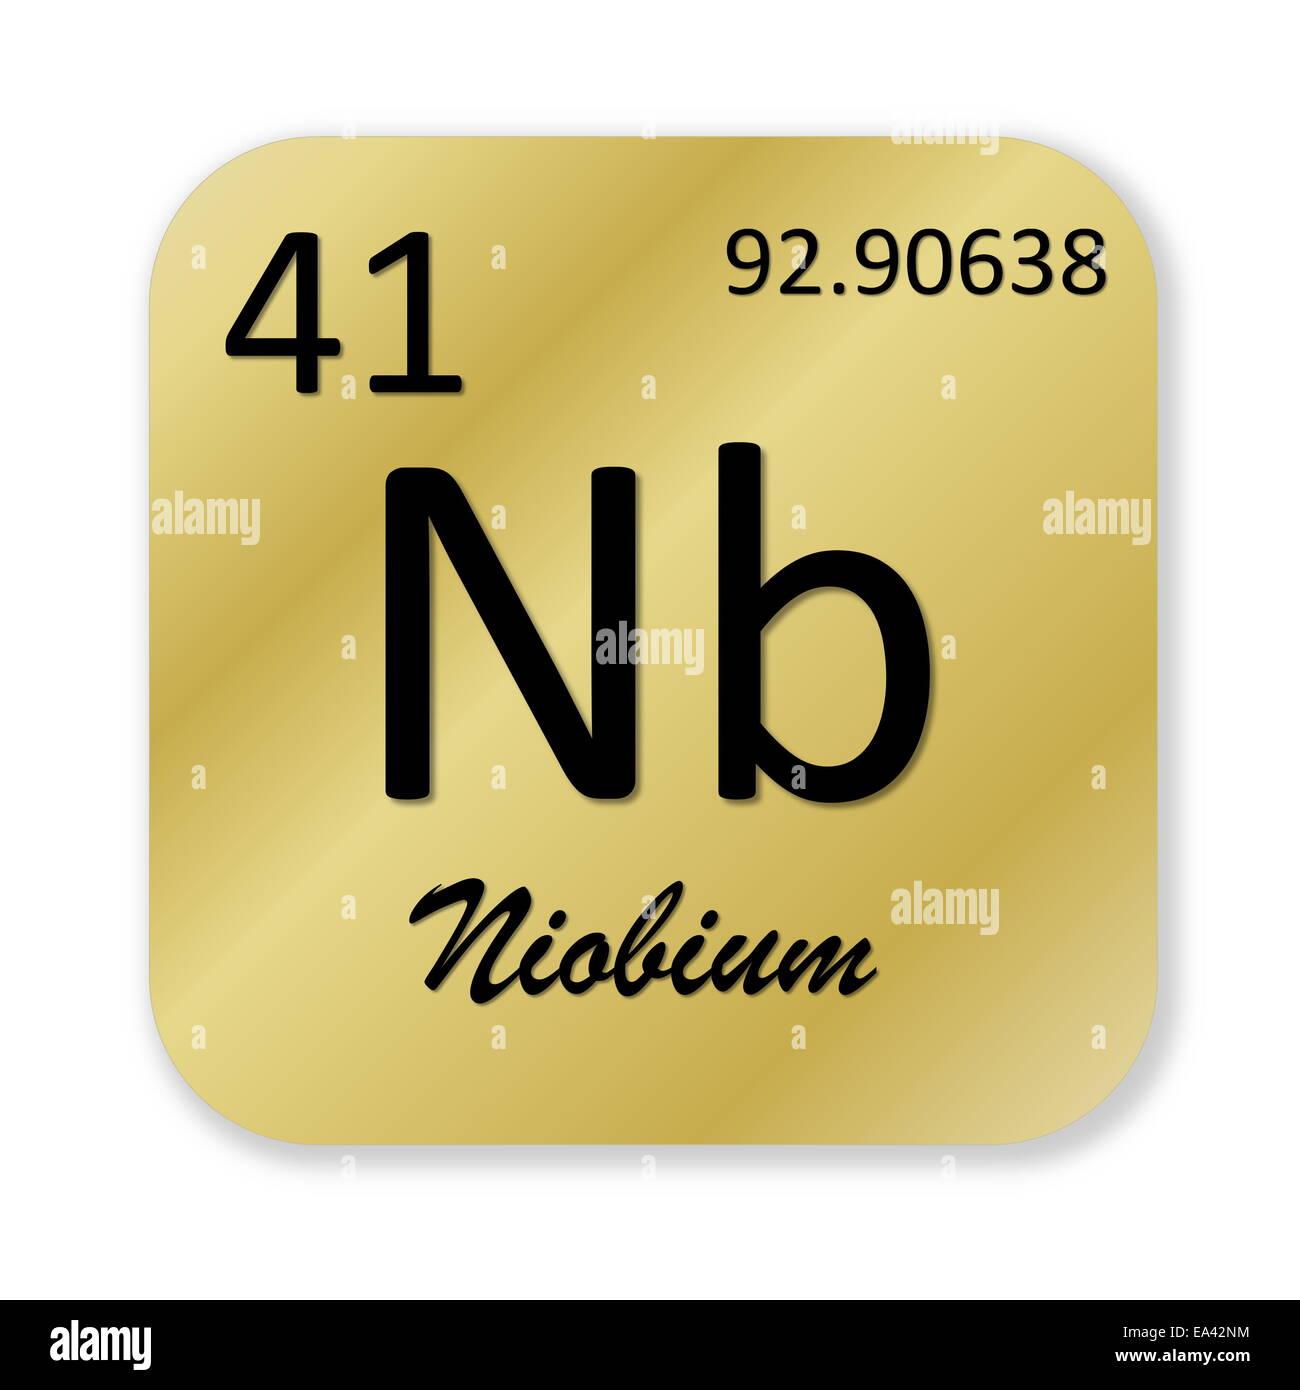 Niobium element stock photo royalty free image 75078016 alamy niobium element biocorpaavc